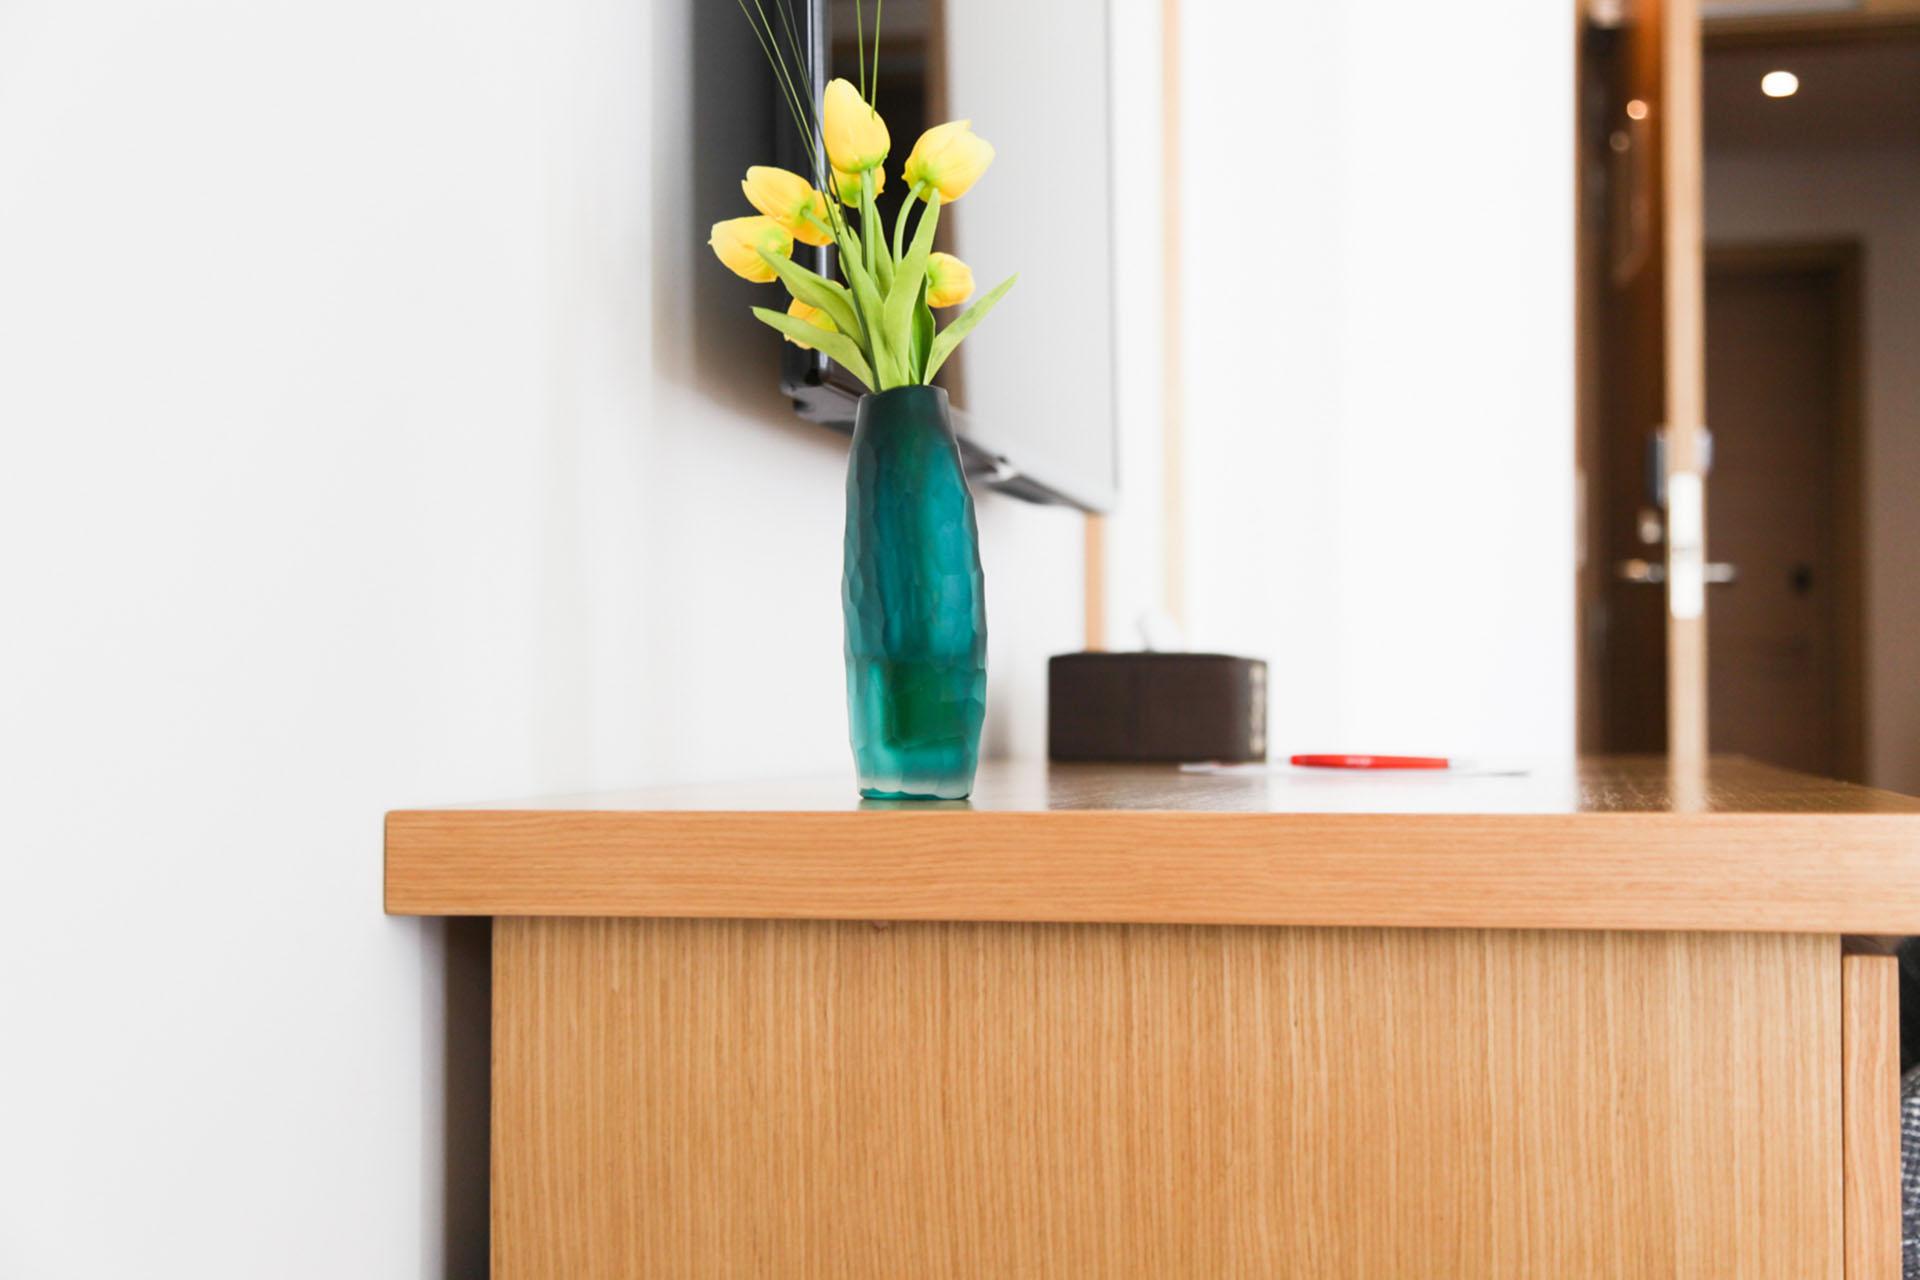 http://smartshotel.com/wp-content/uploads/2016/10/Superior-Room-Working-Desk-1.jpg